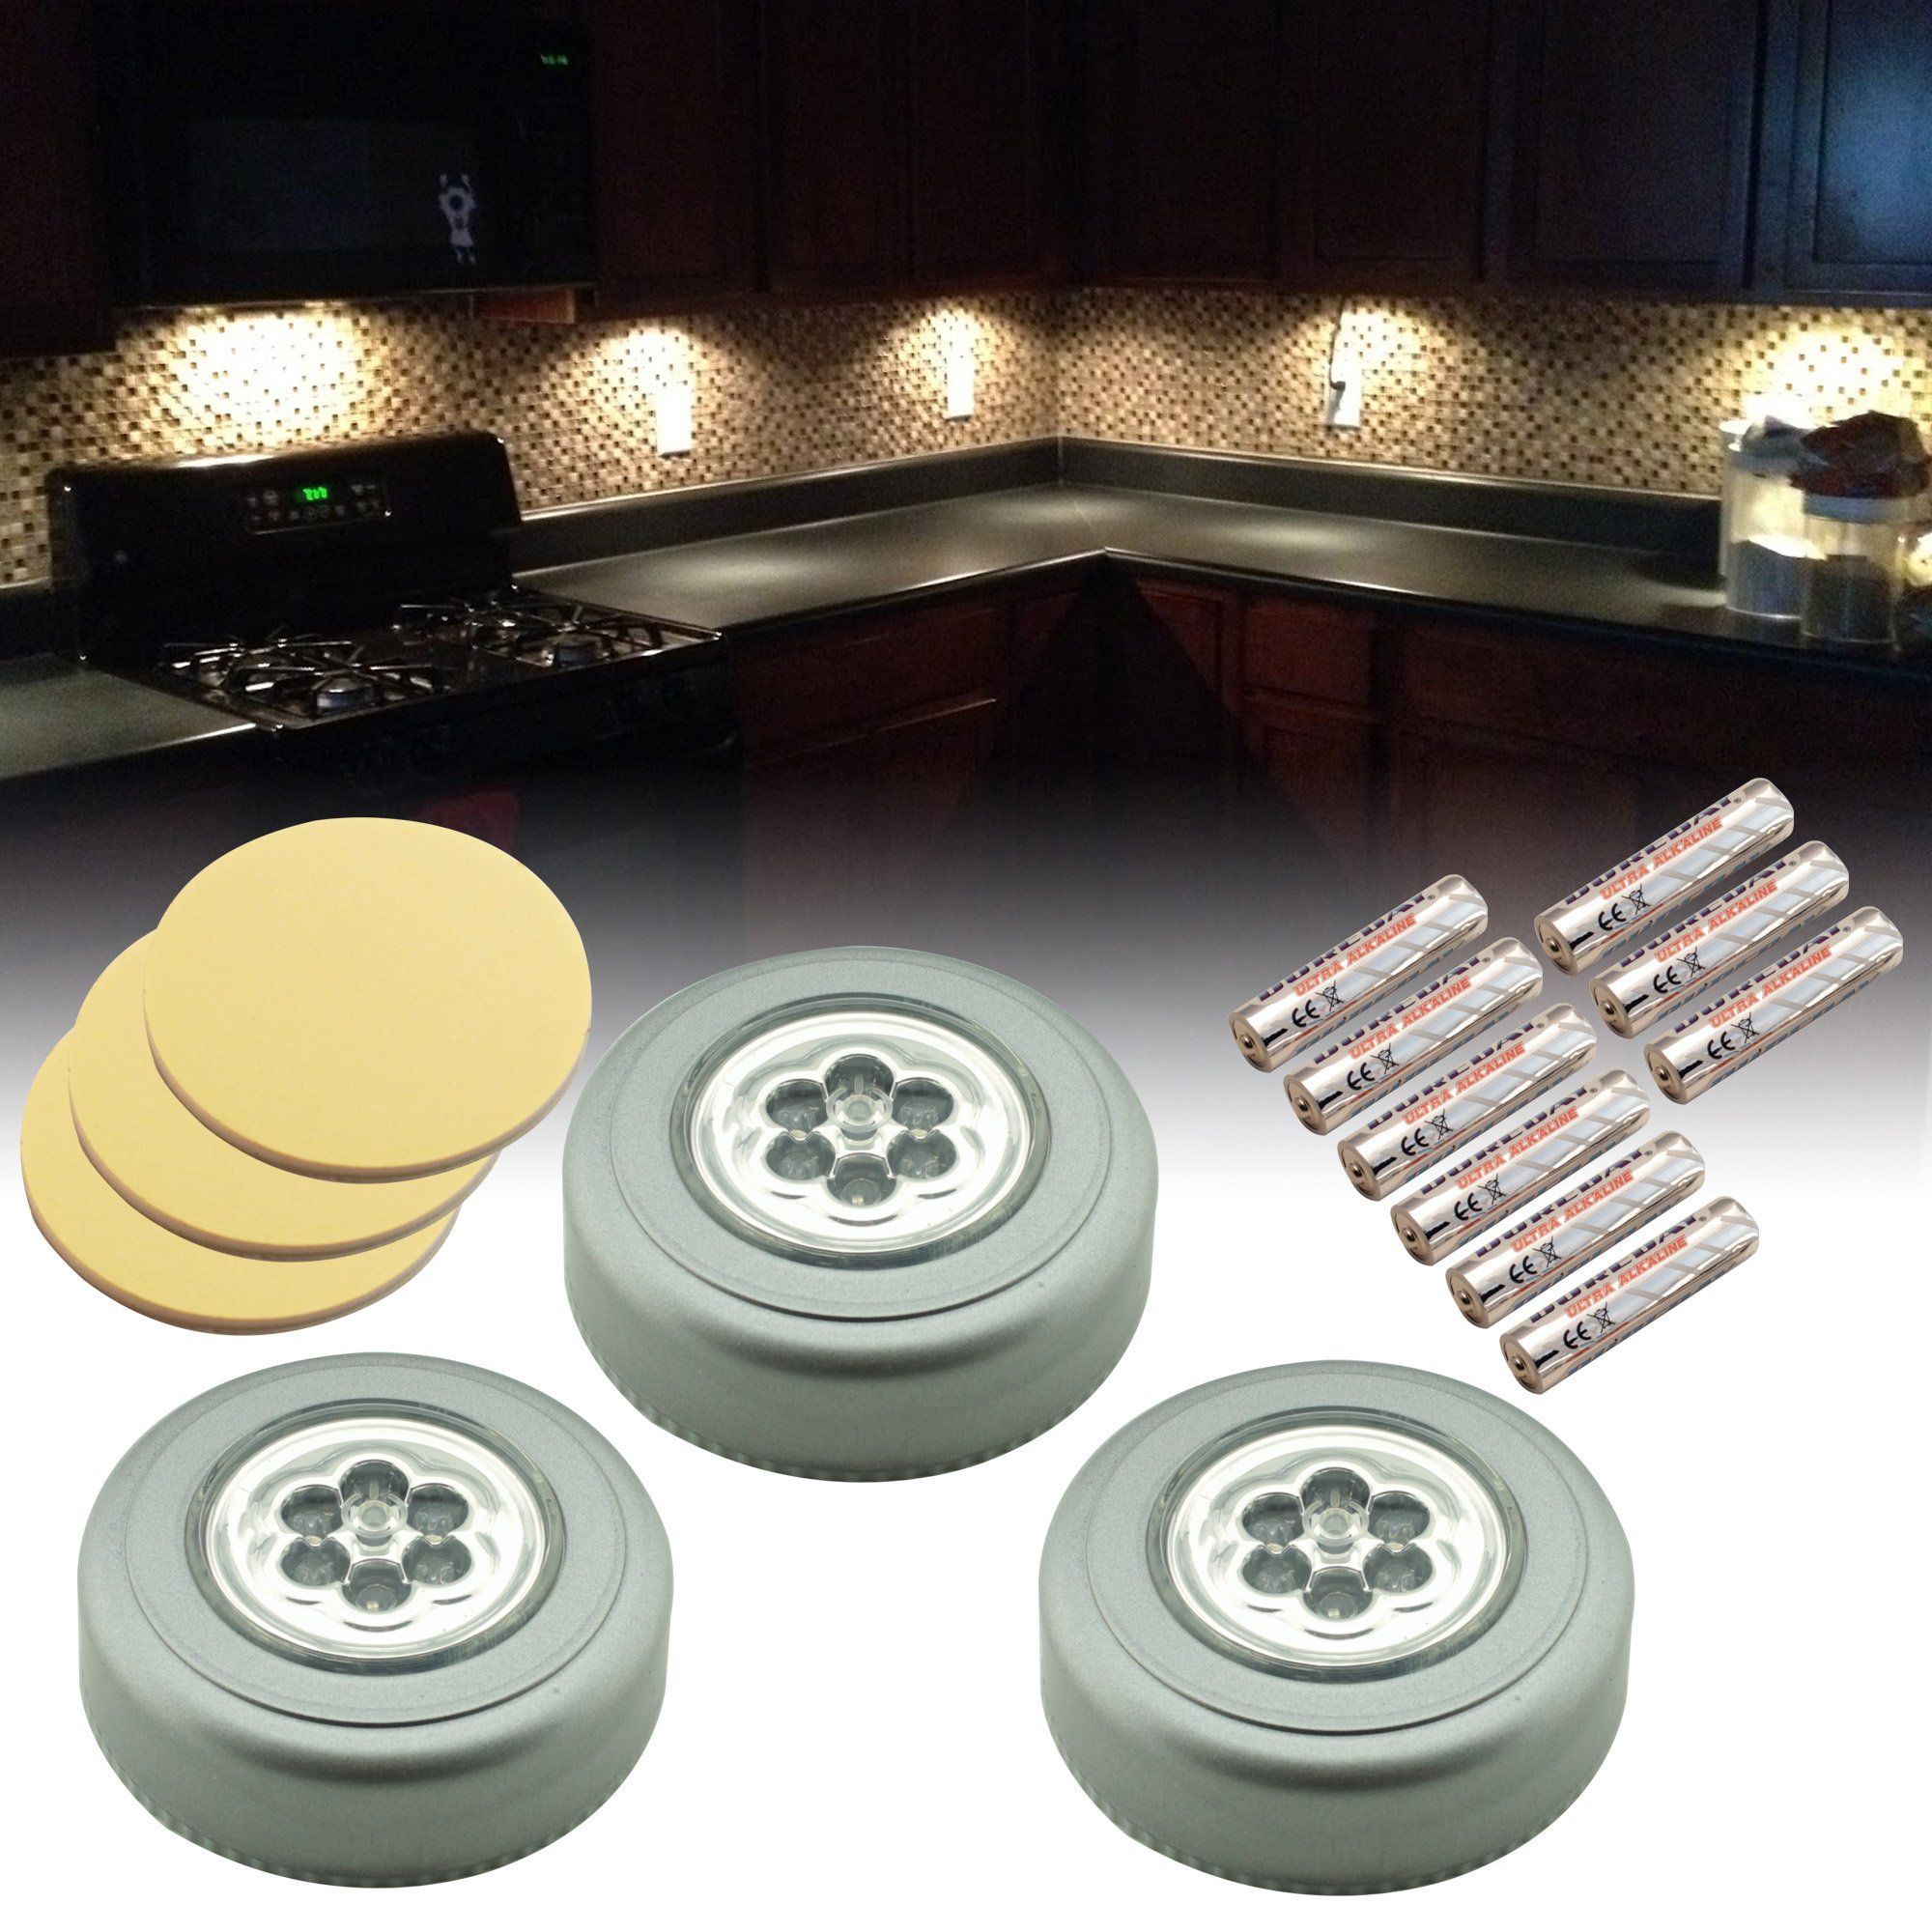 Hobbie Bug Led Stick On Tap Light Silver 3 Pack Batteries Included Amazon Com Led Stick Puck Lights Led Light Stick